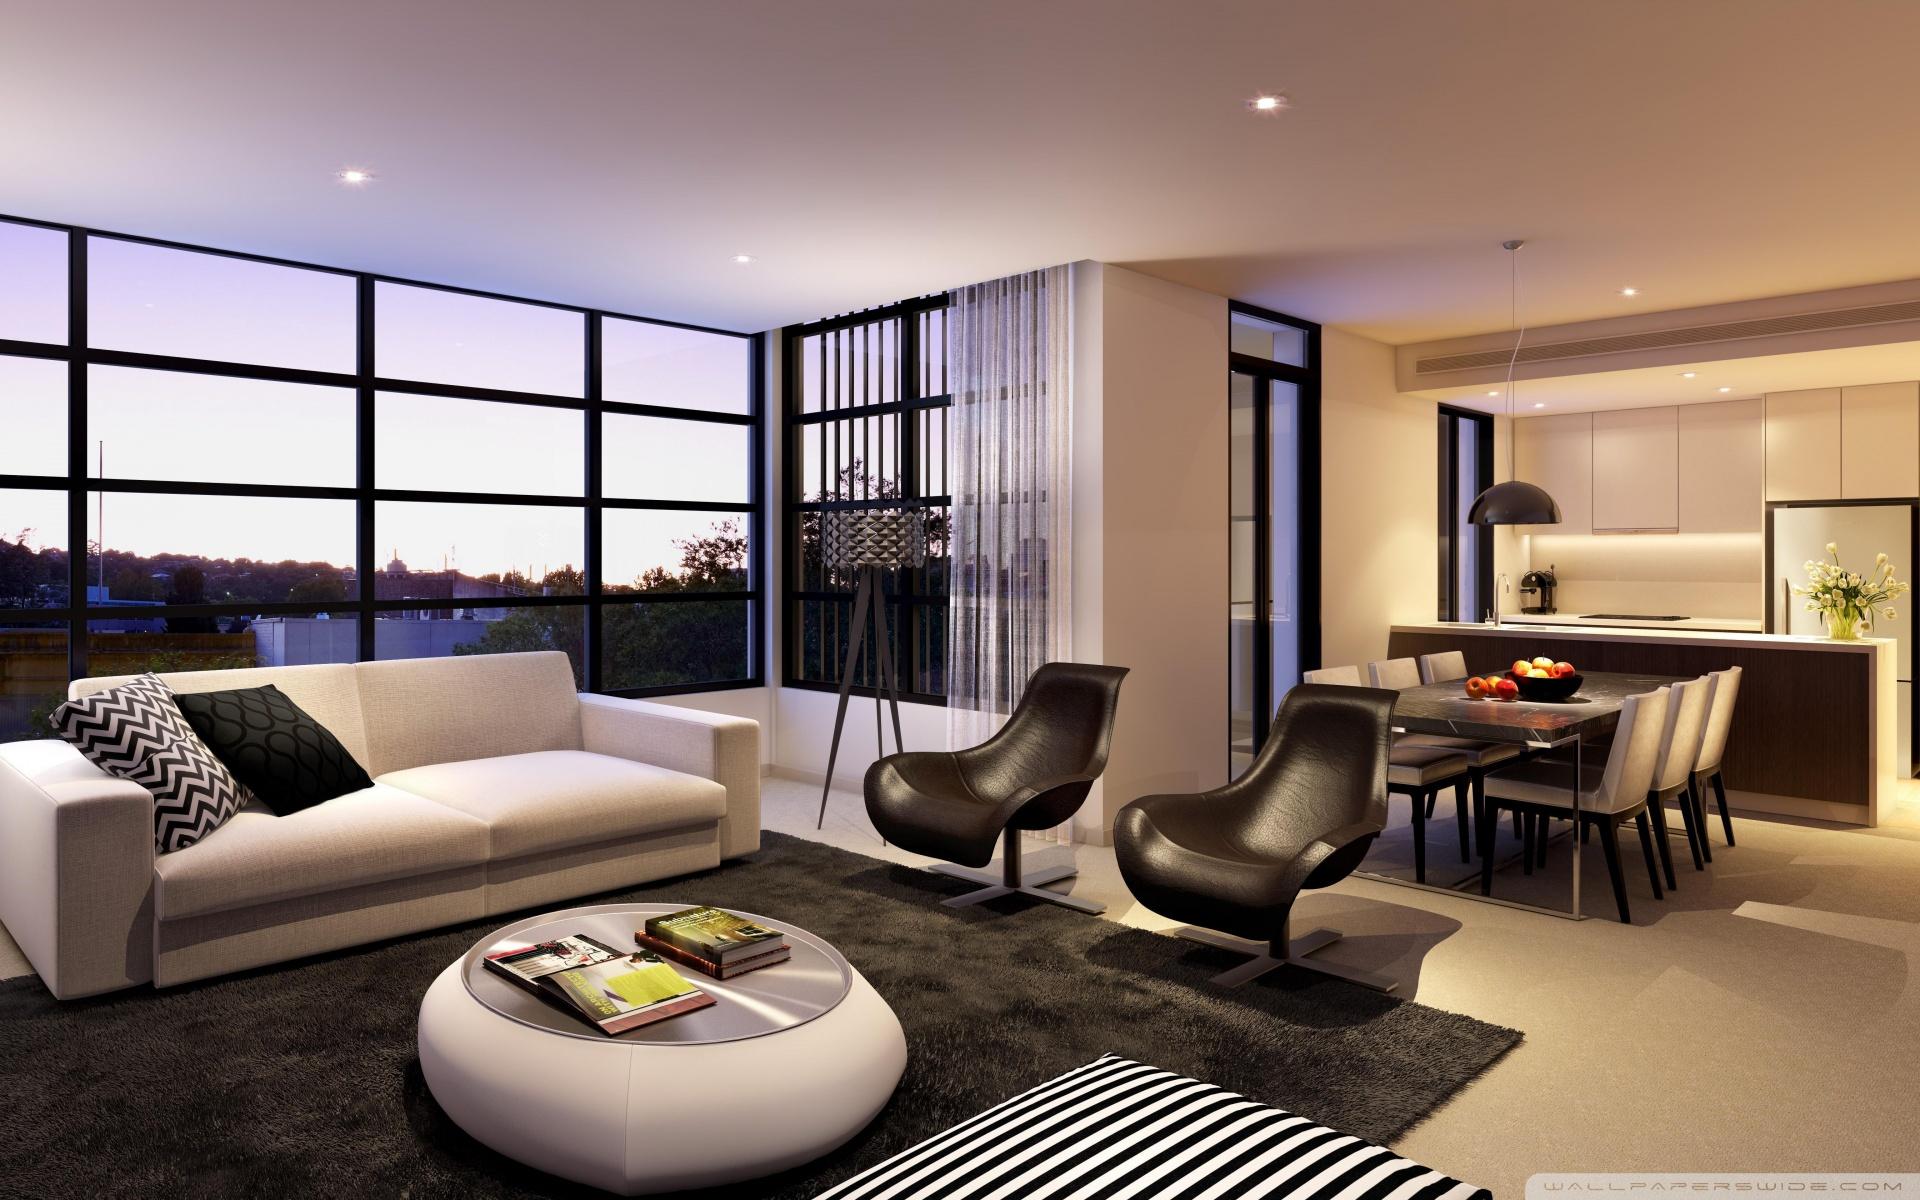 living_room_design_2-wallpaper-1920x1200